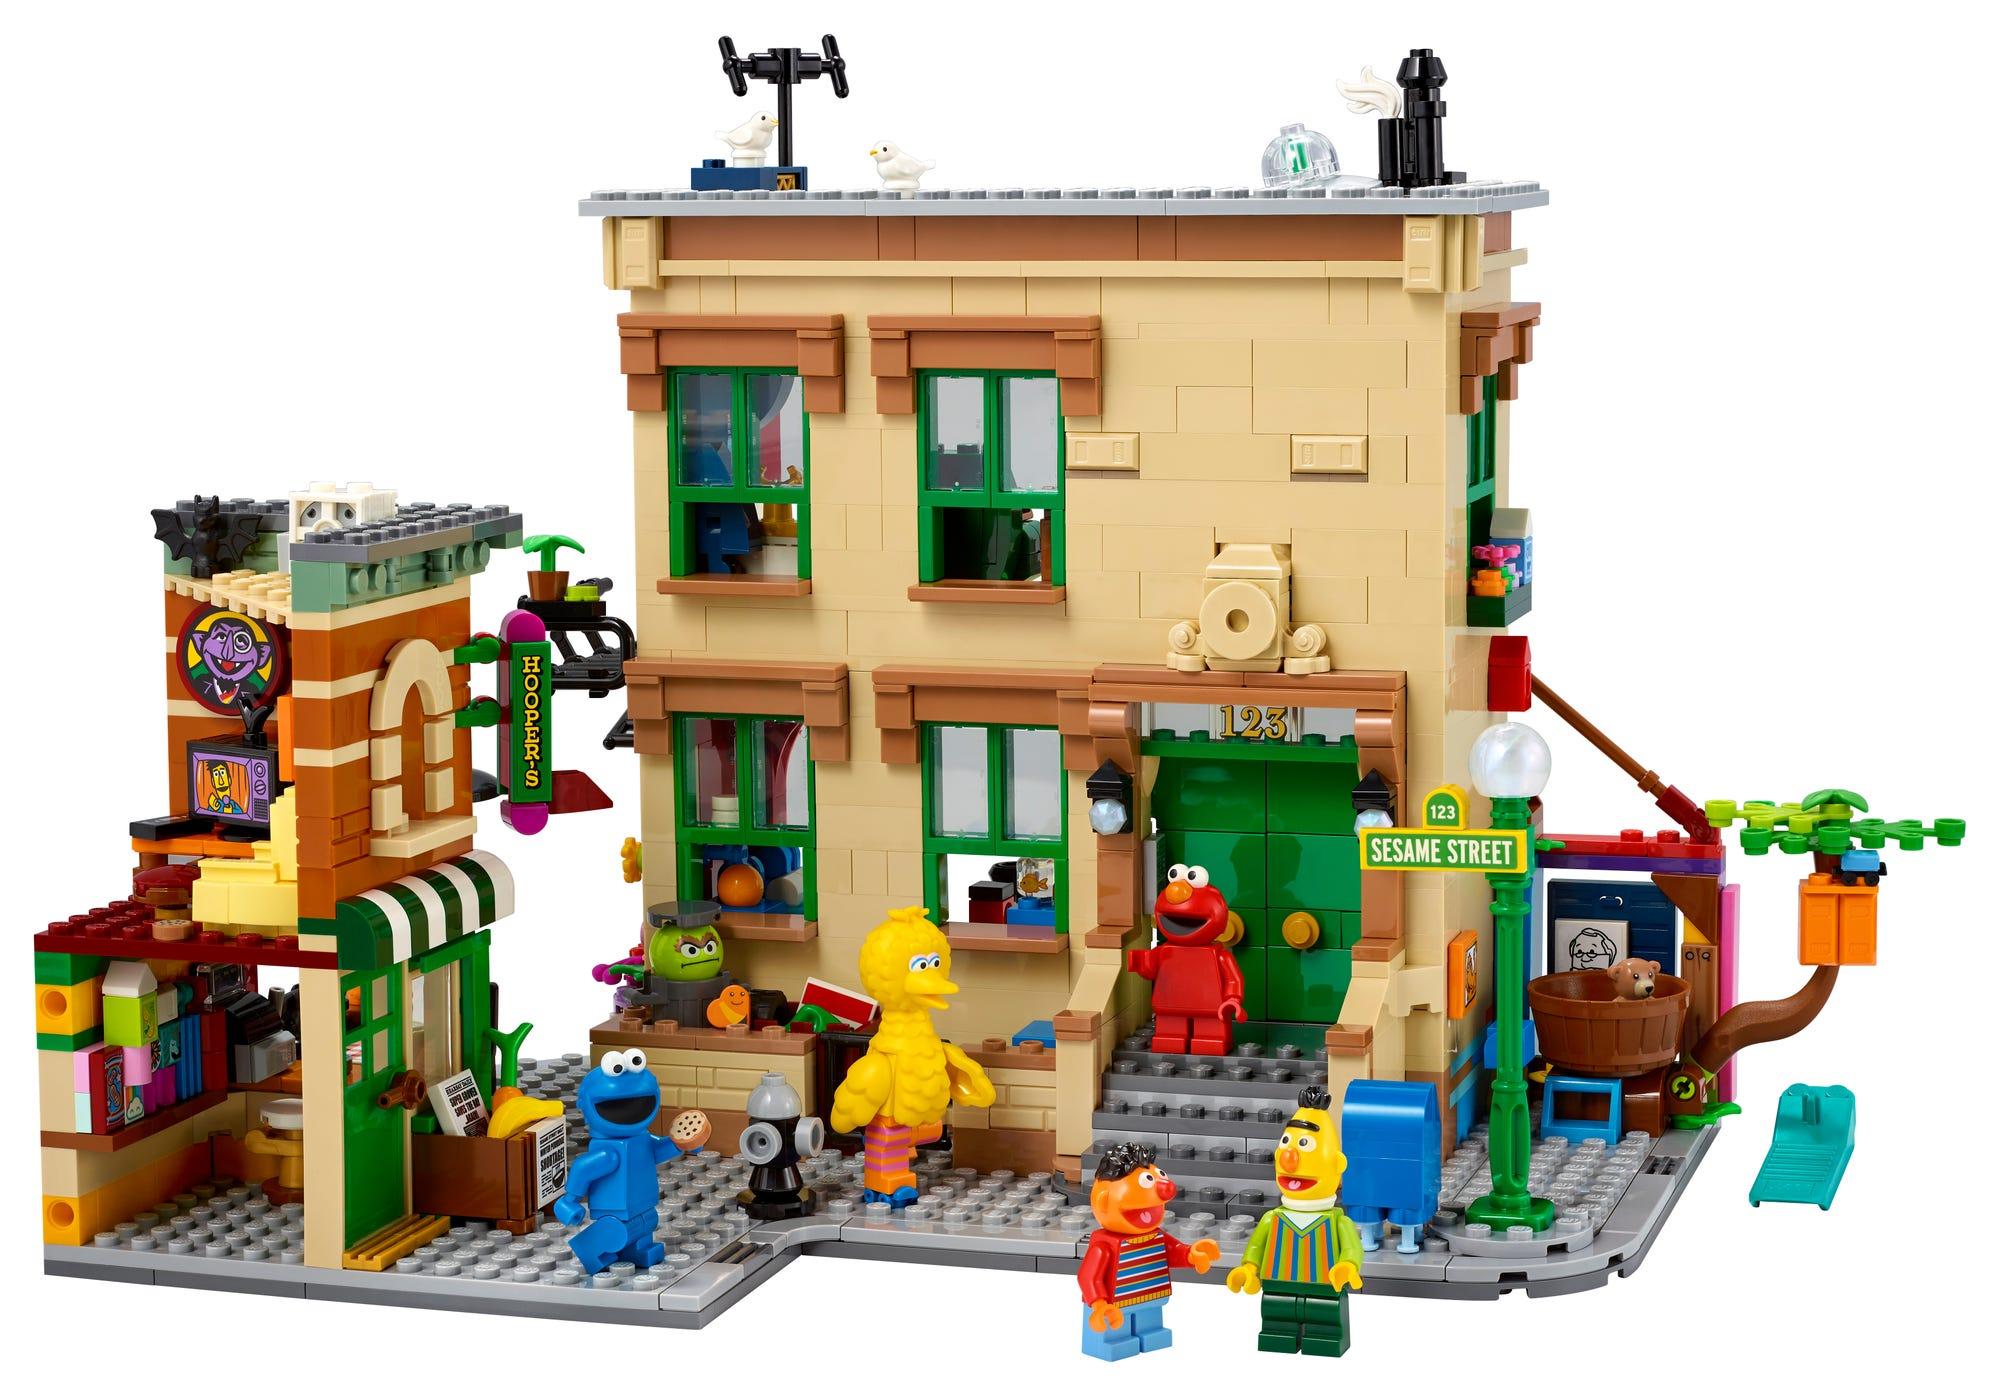 LEGO Ideas 21324 Sesame Street (1)